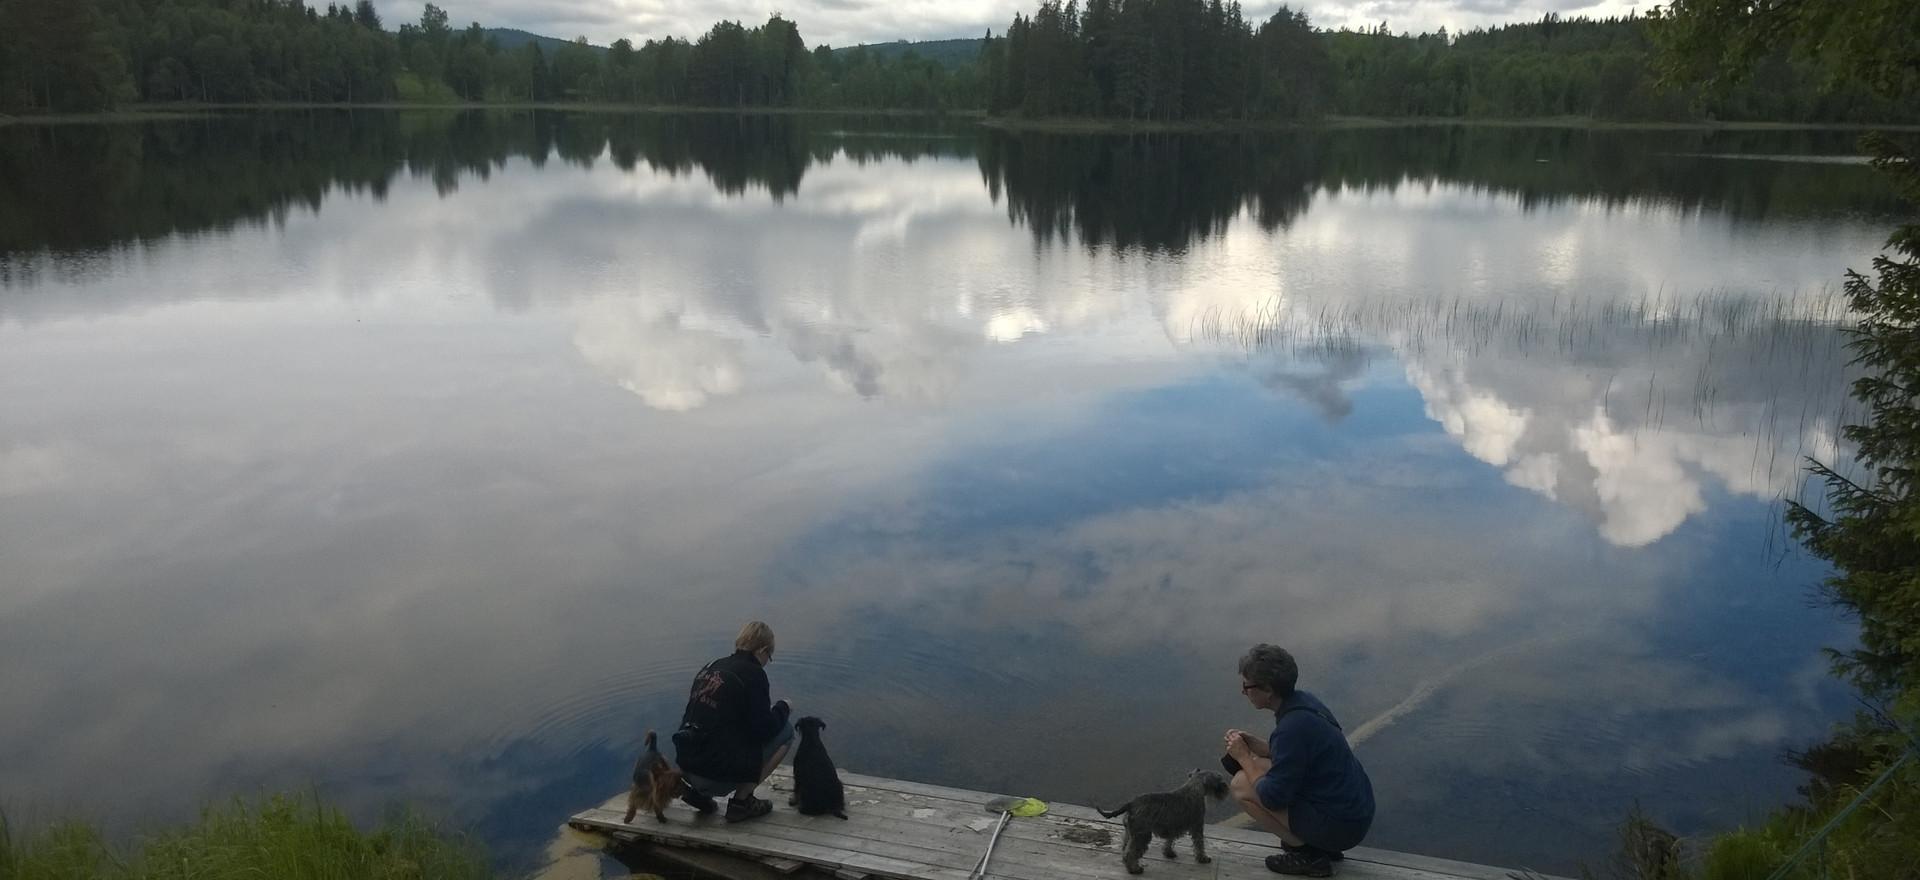 Lill-Vamsjön